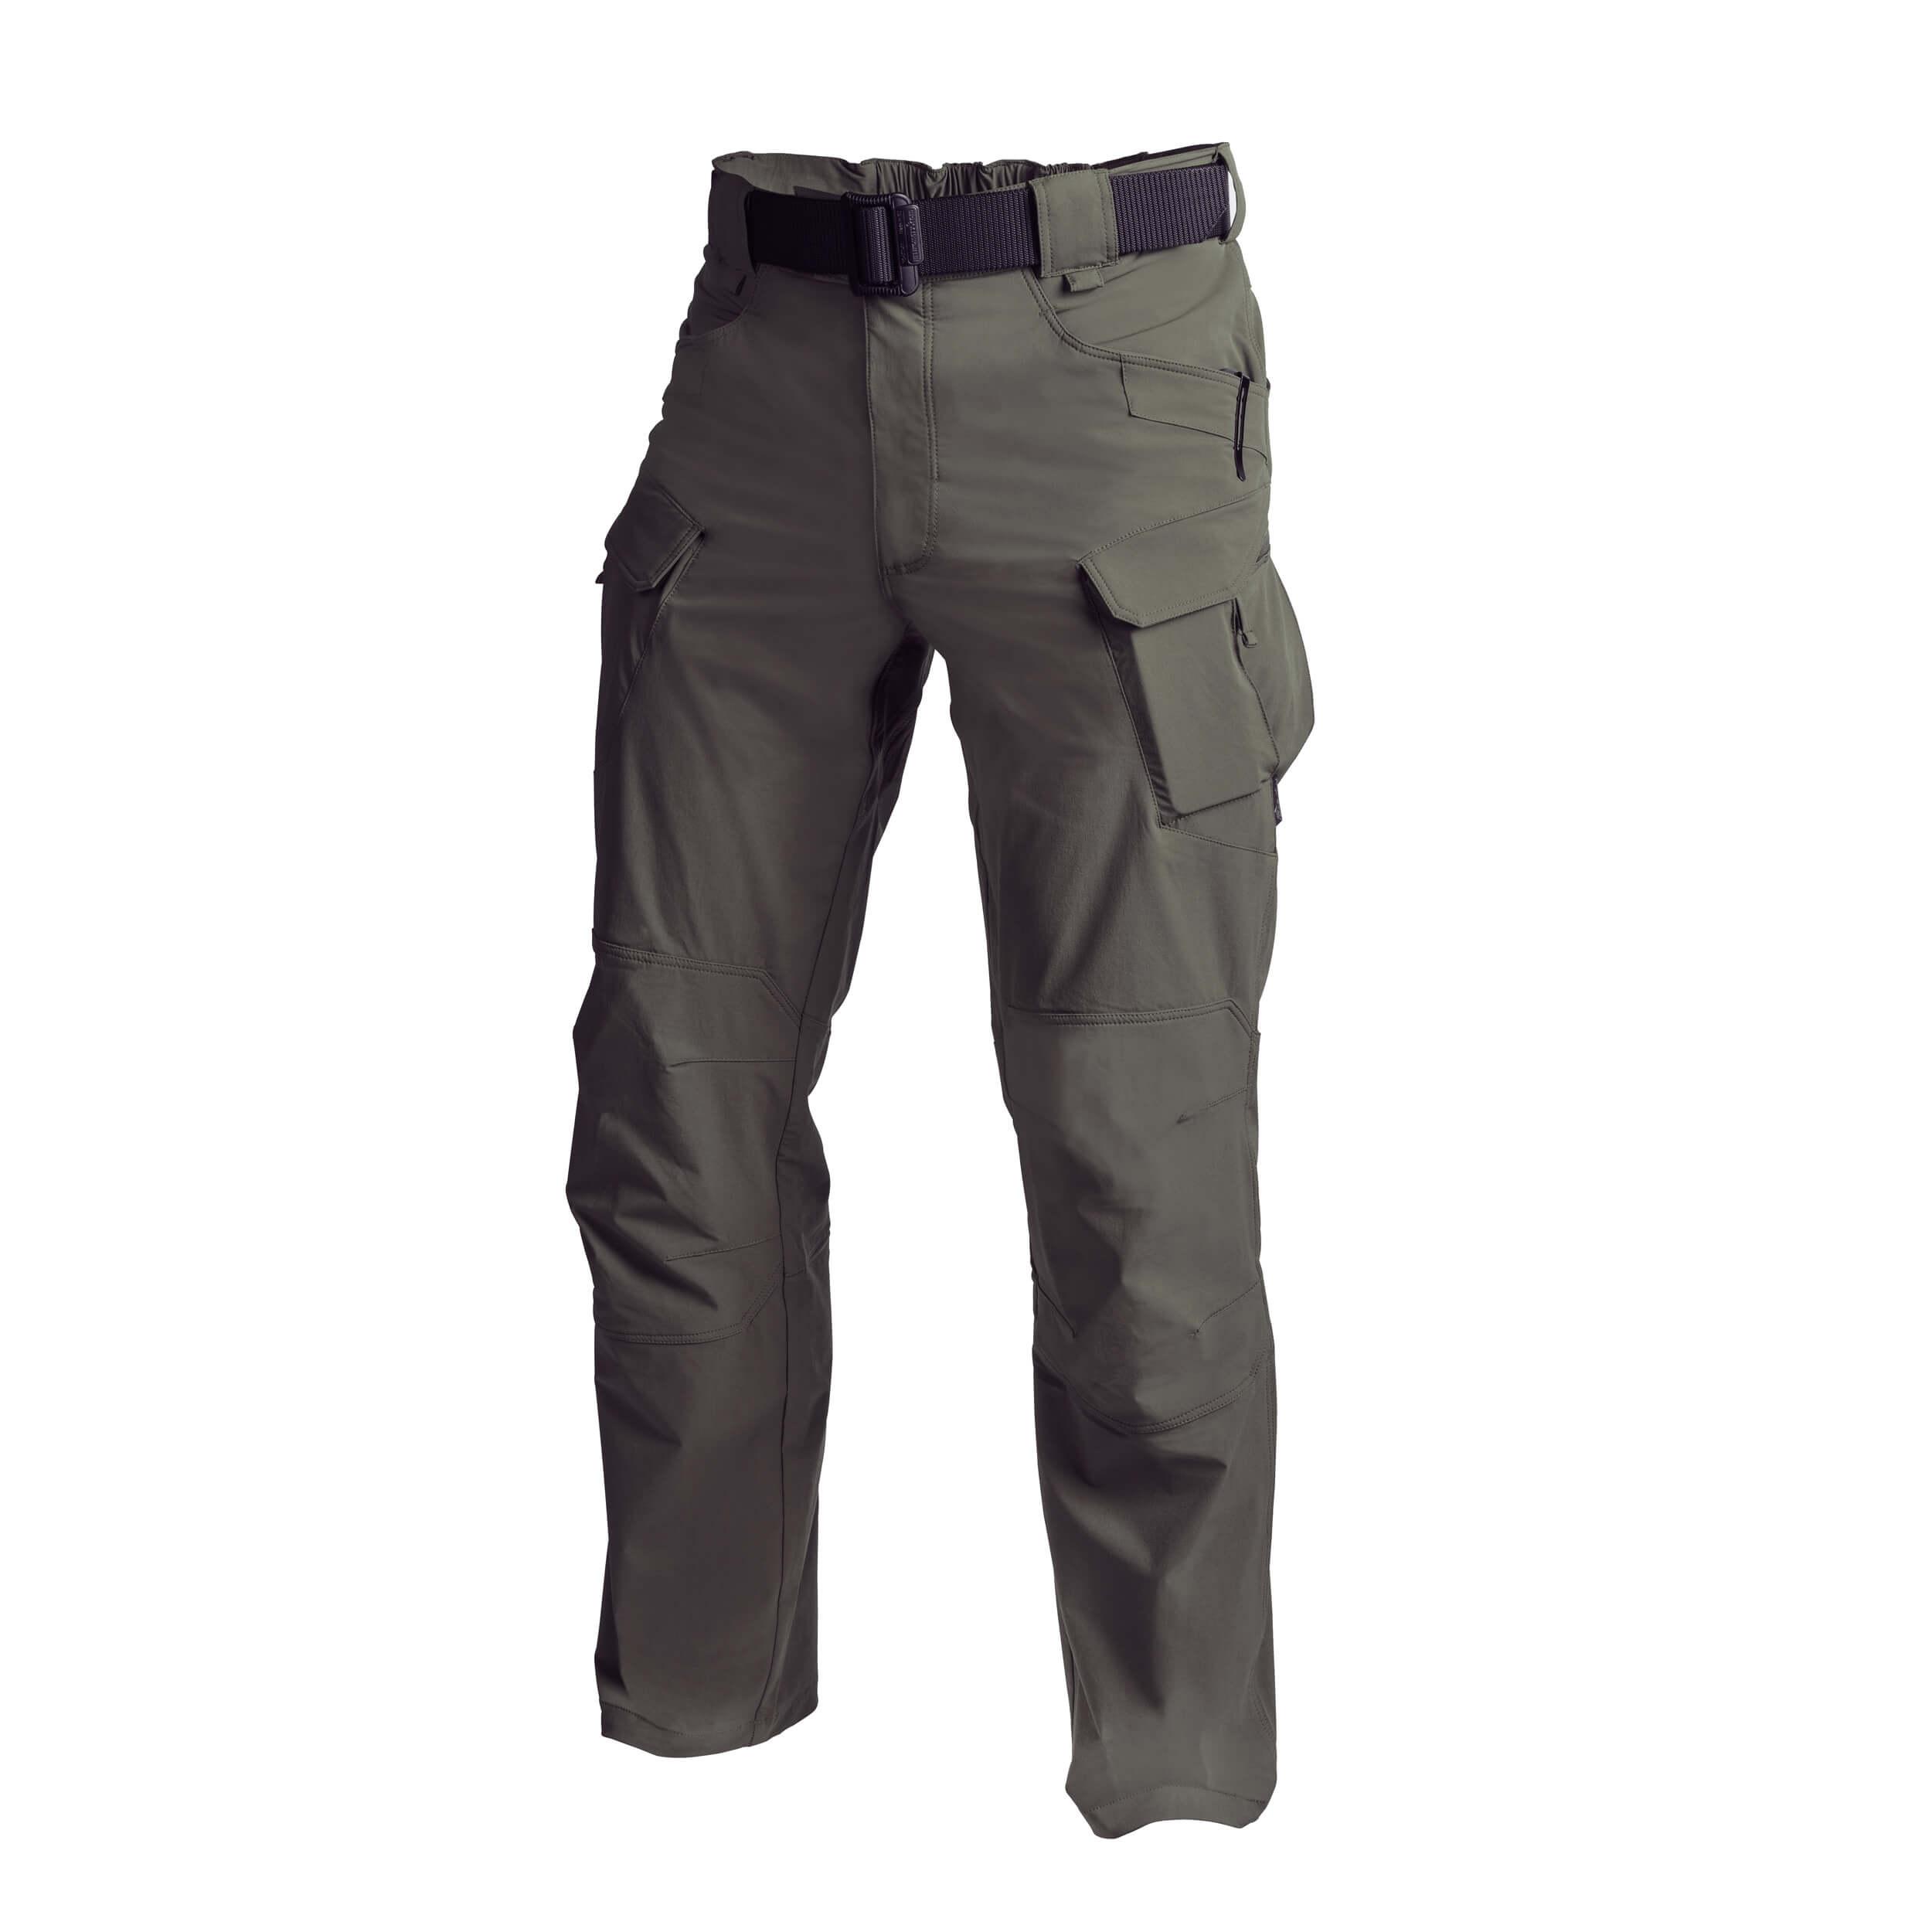 Helikon-Tex OTP Hose (Outdoor Tactical Pants) - VersaStretch - Taiga Green